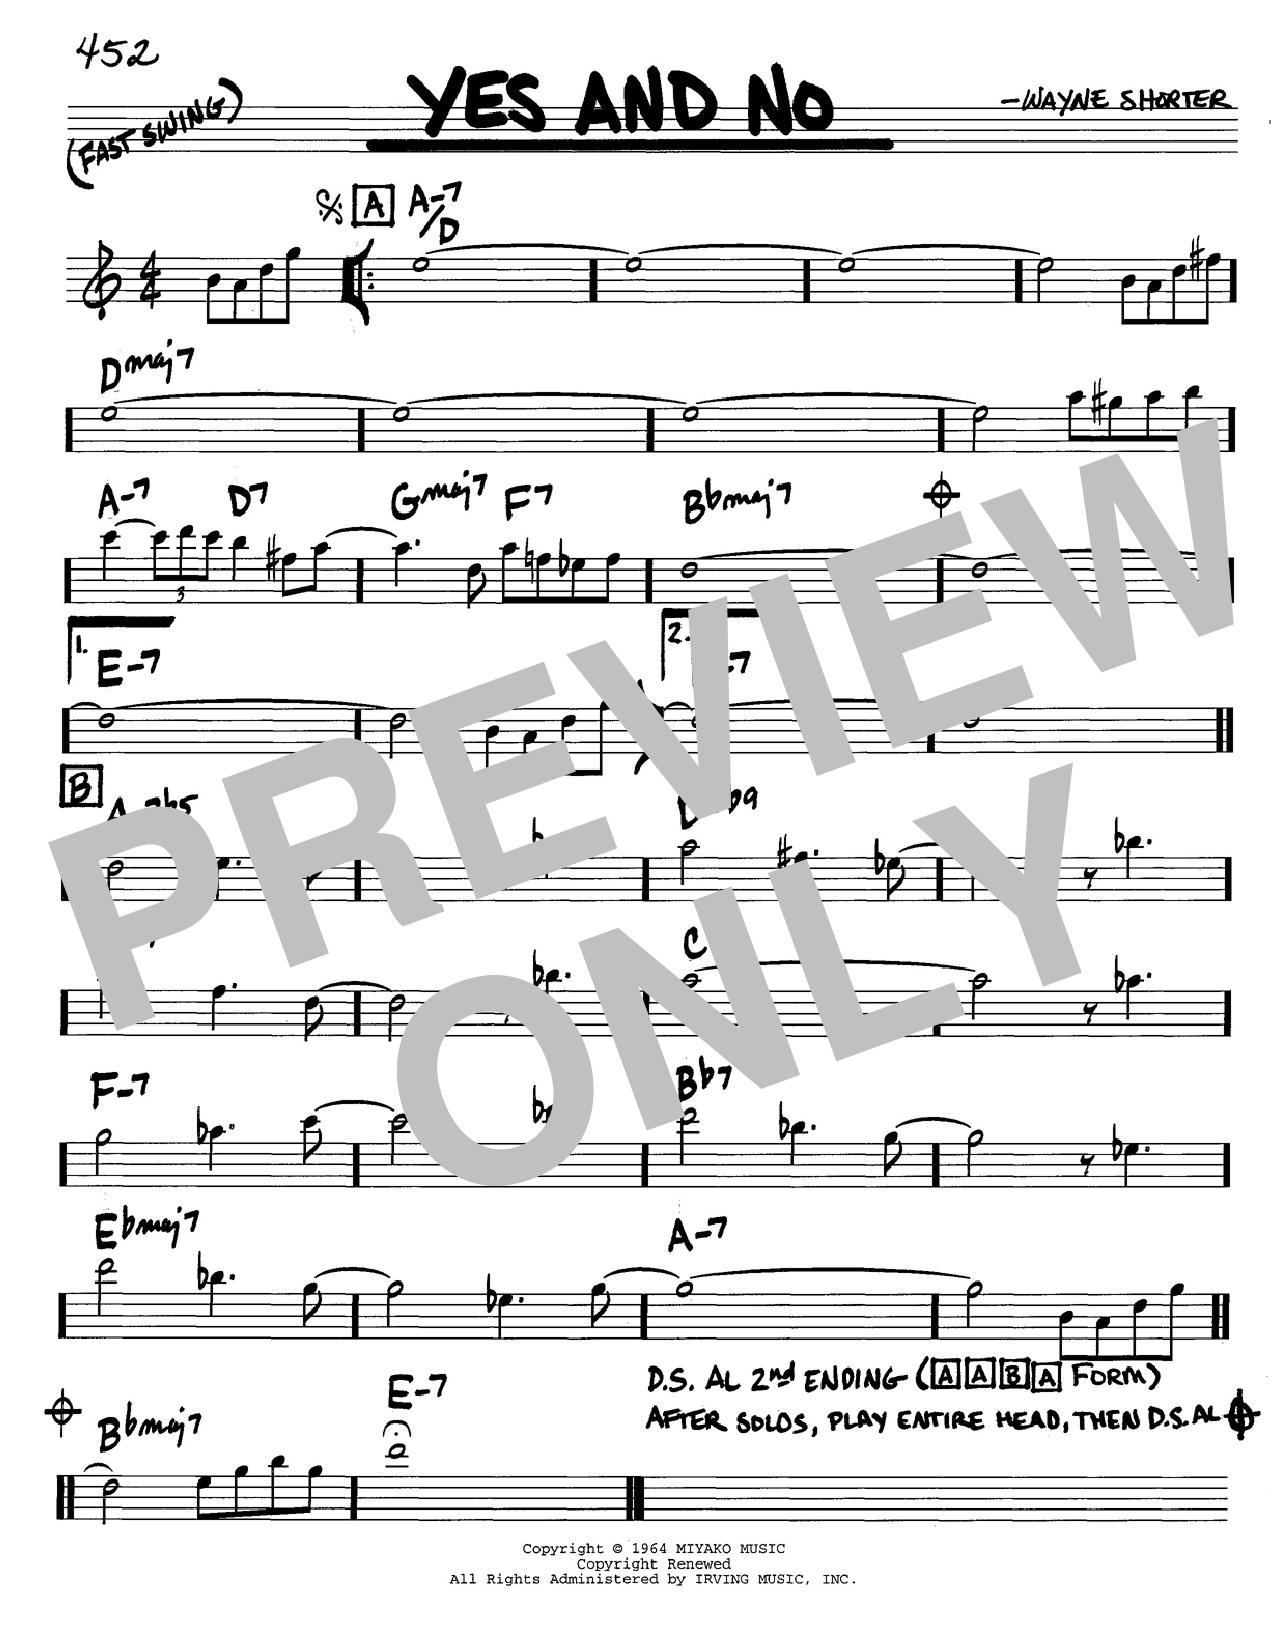 Wayne Shorter Yes And No Sheet Music Notes, Chords   Download Printable  Real Book – Melody & Chords – Eb Instruments PDF Score   SKU 15